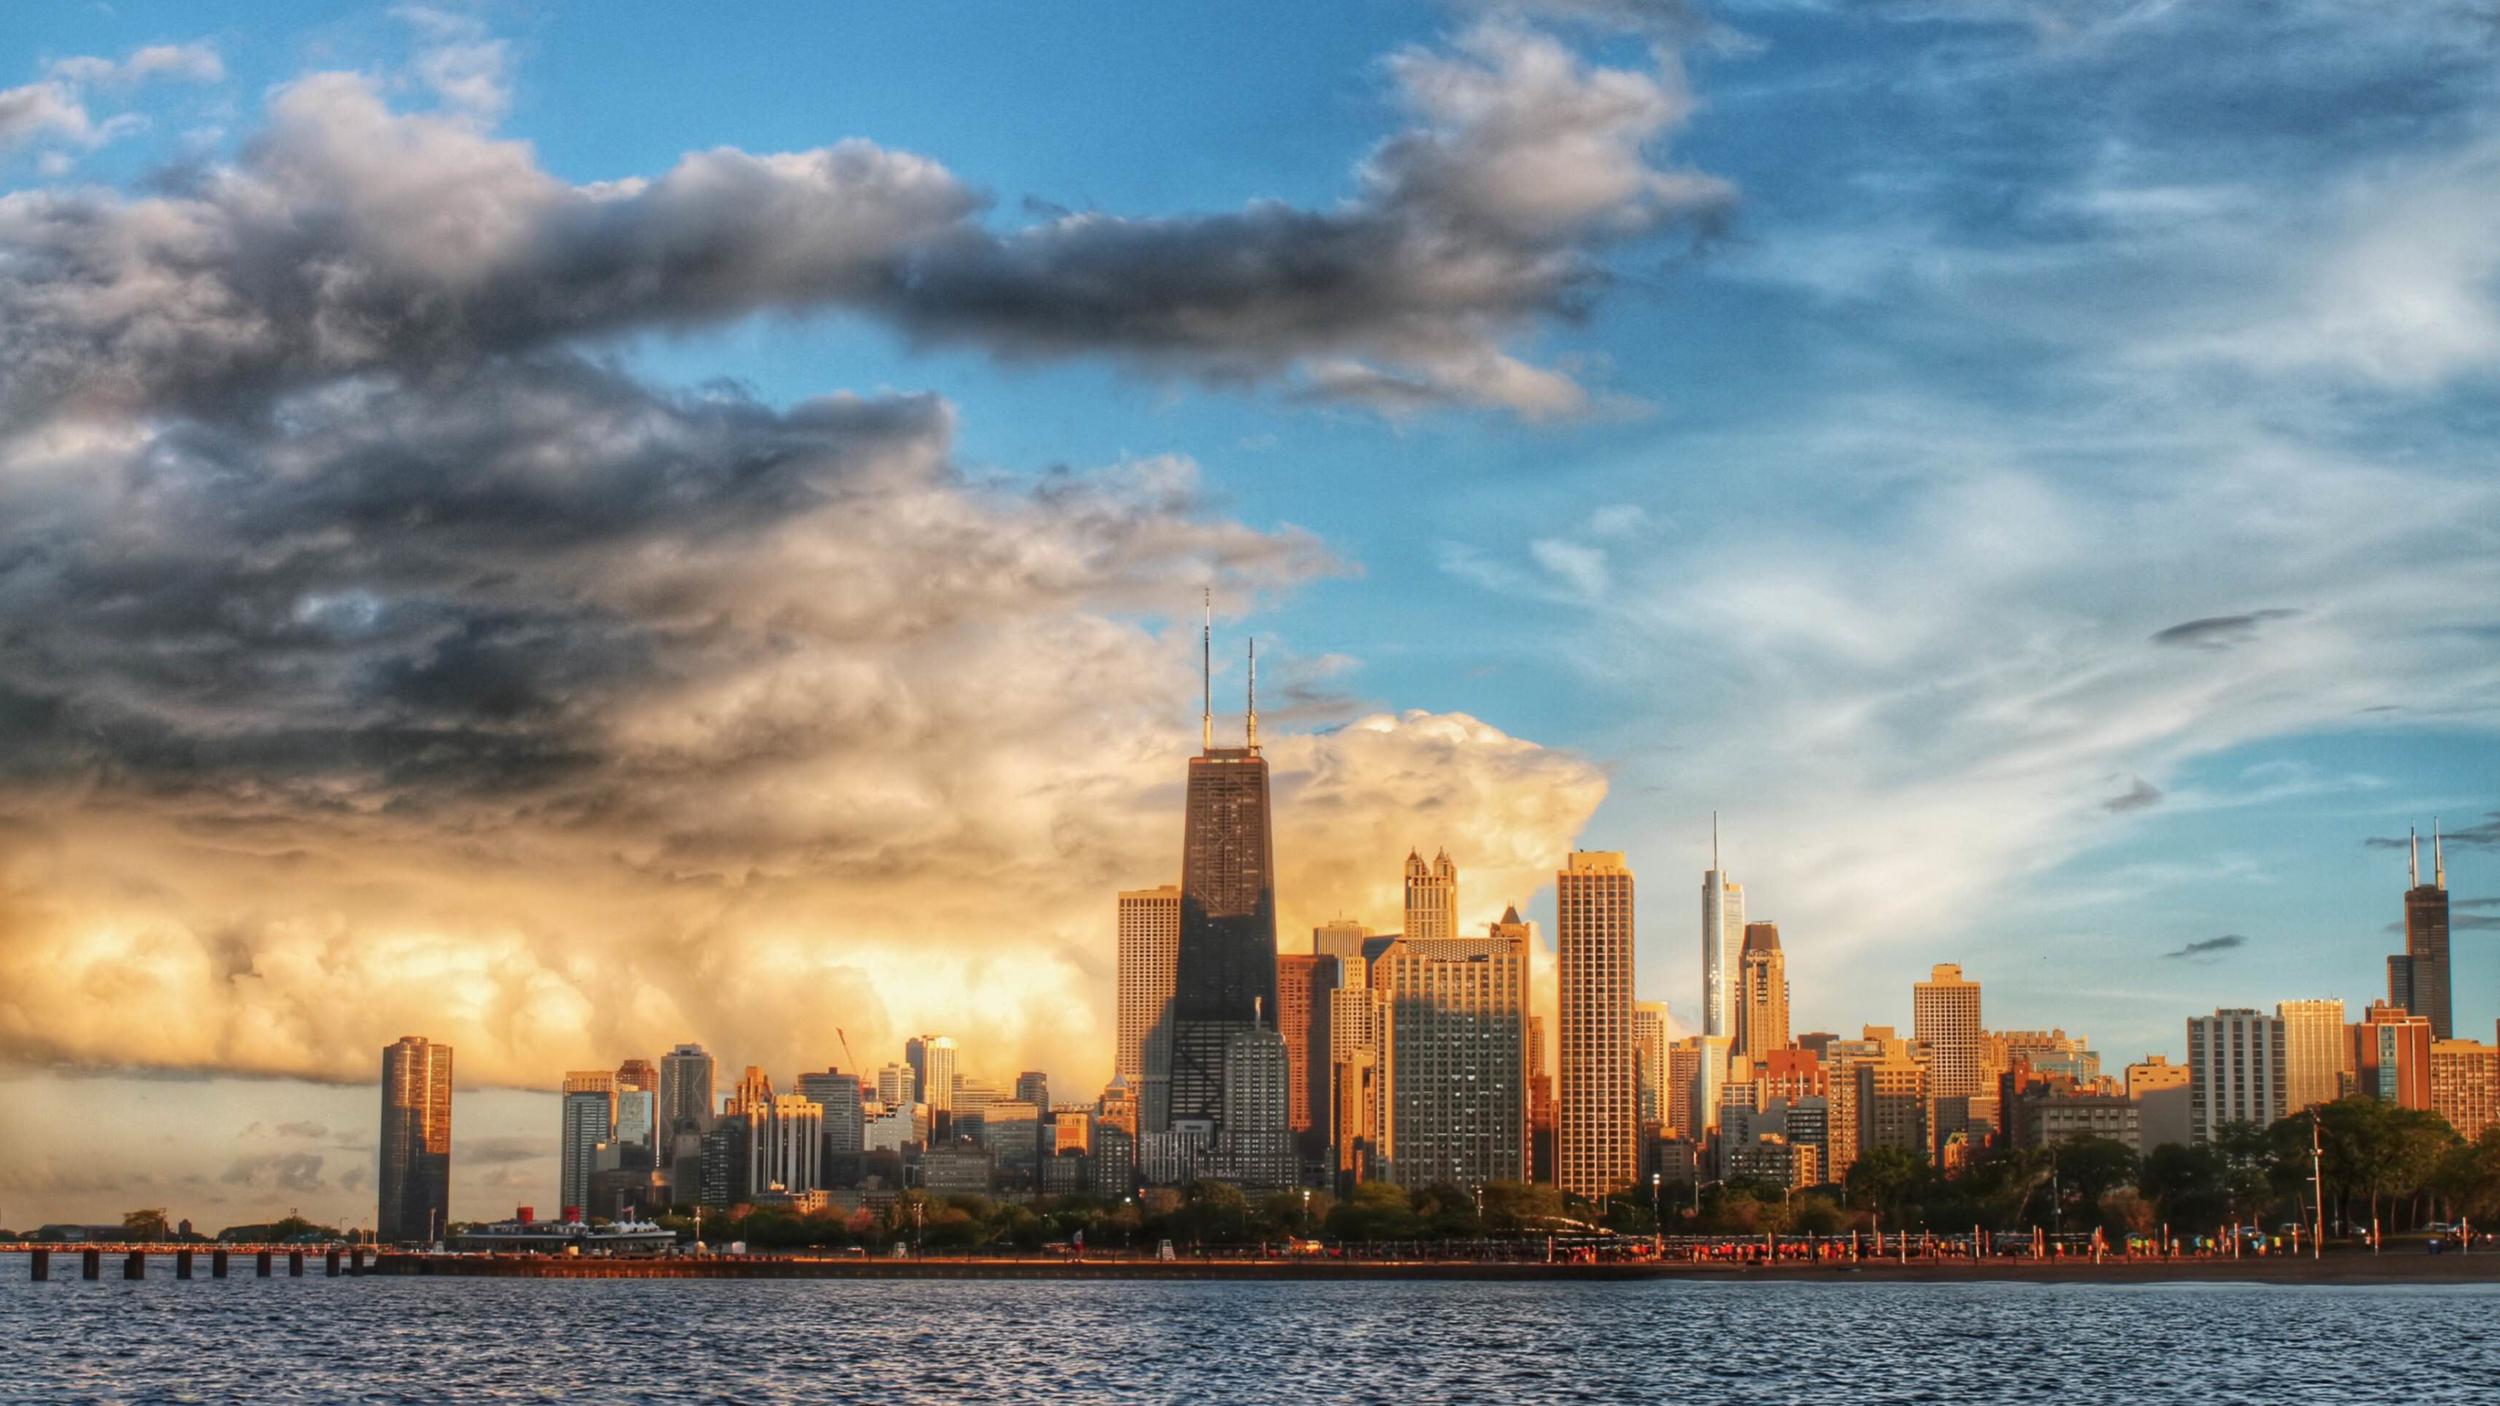 Clouds and Skyline - Copy.jpg